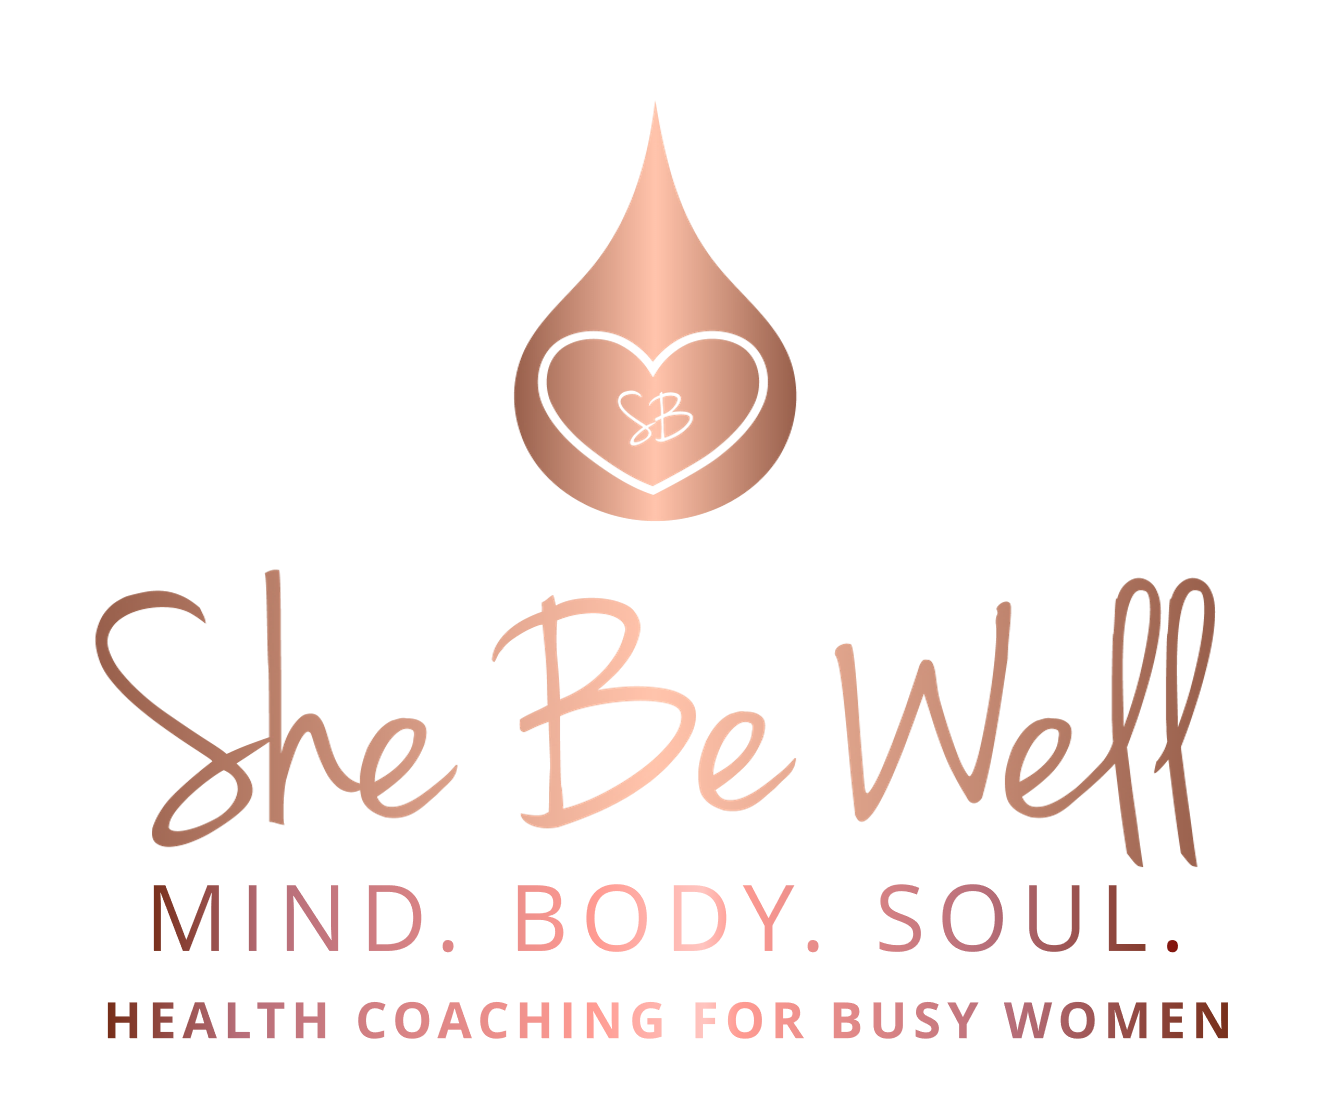 Sheila Berg Wellness